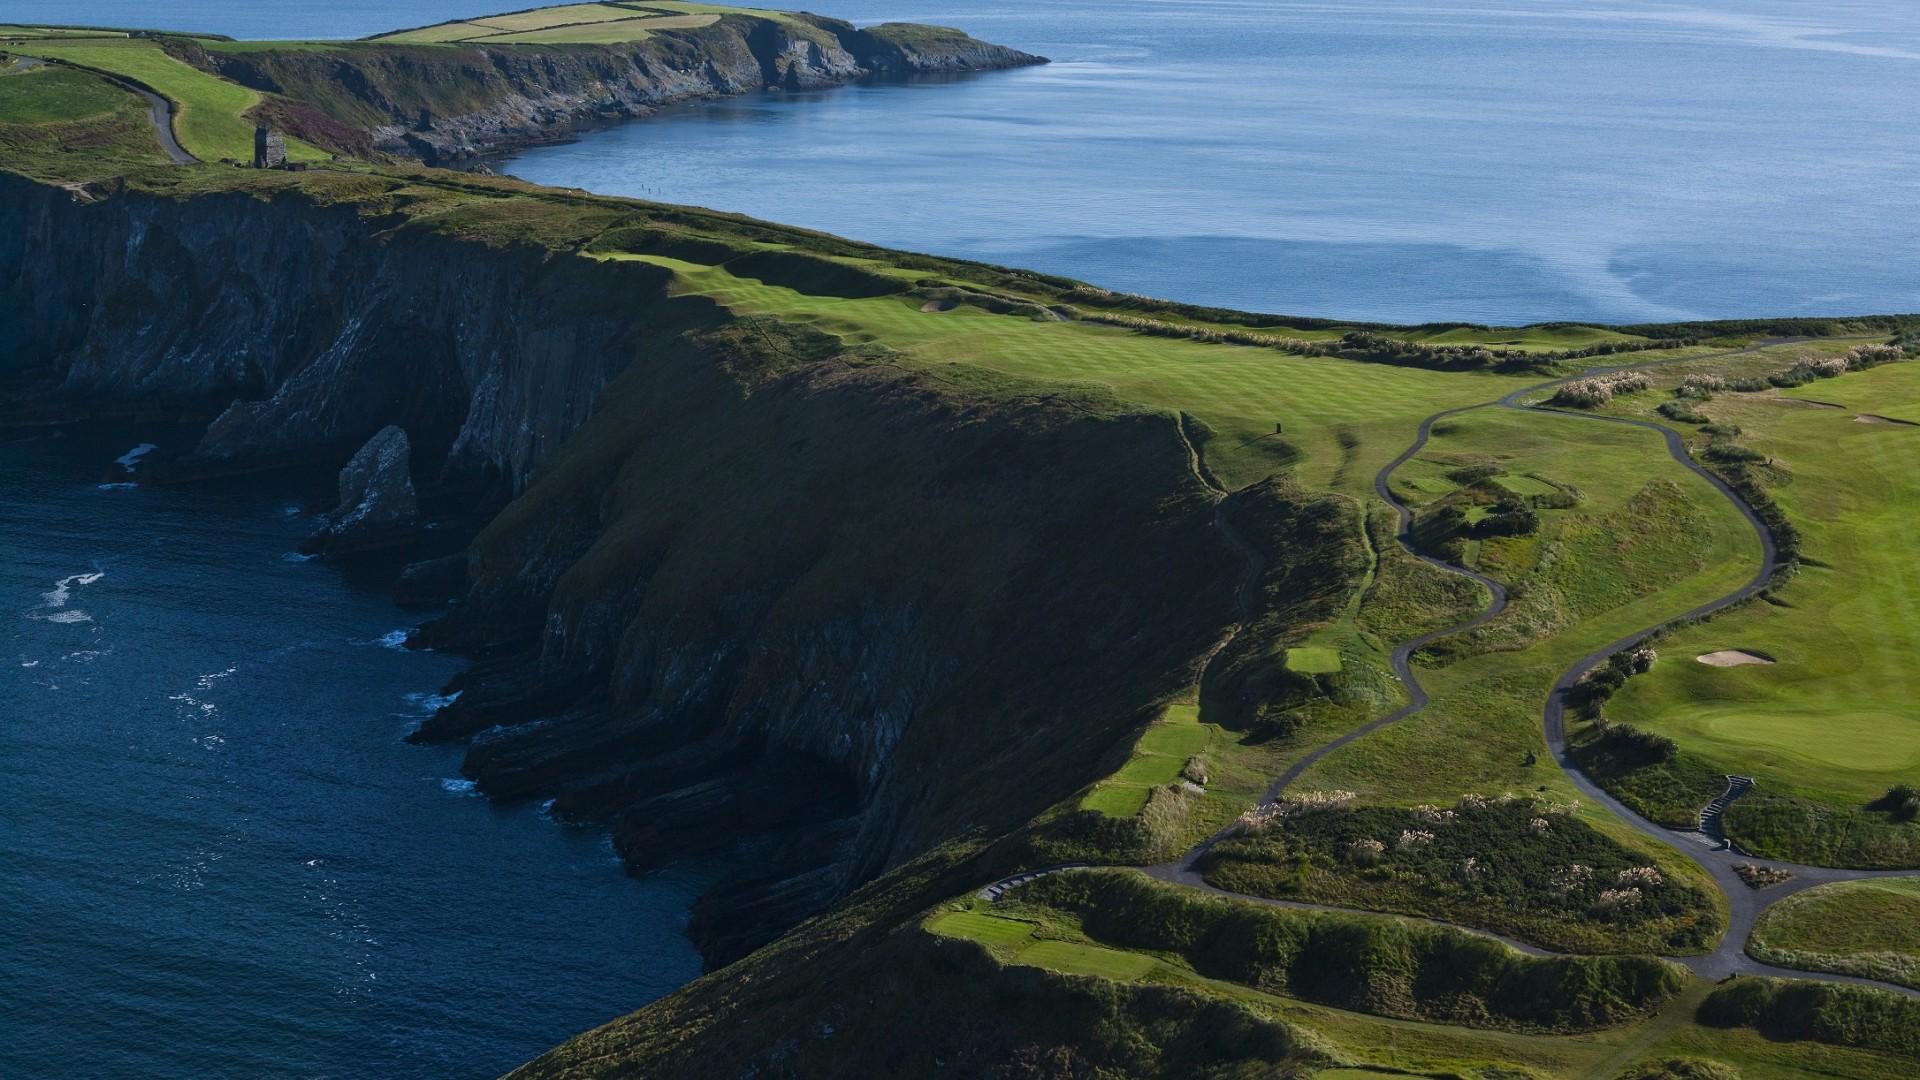 Old Head golf links, Kinsale, County Cork, Ireland